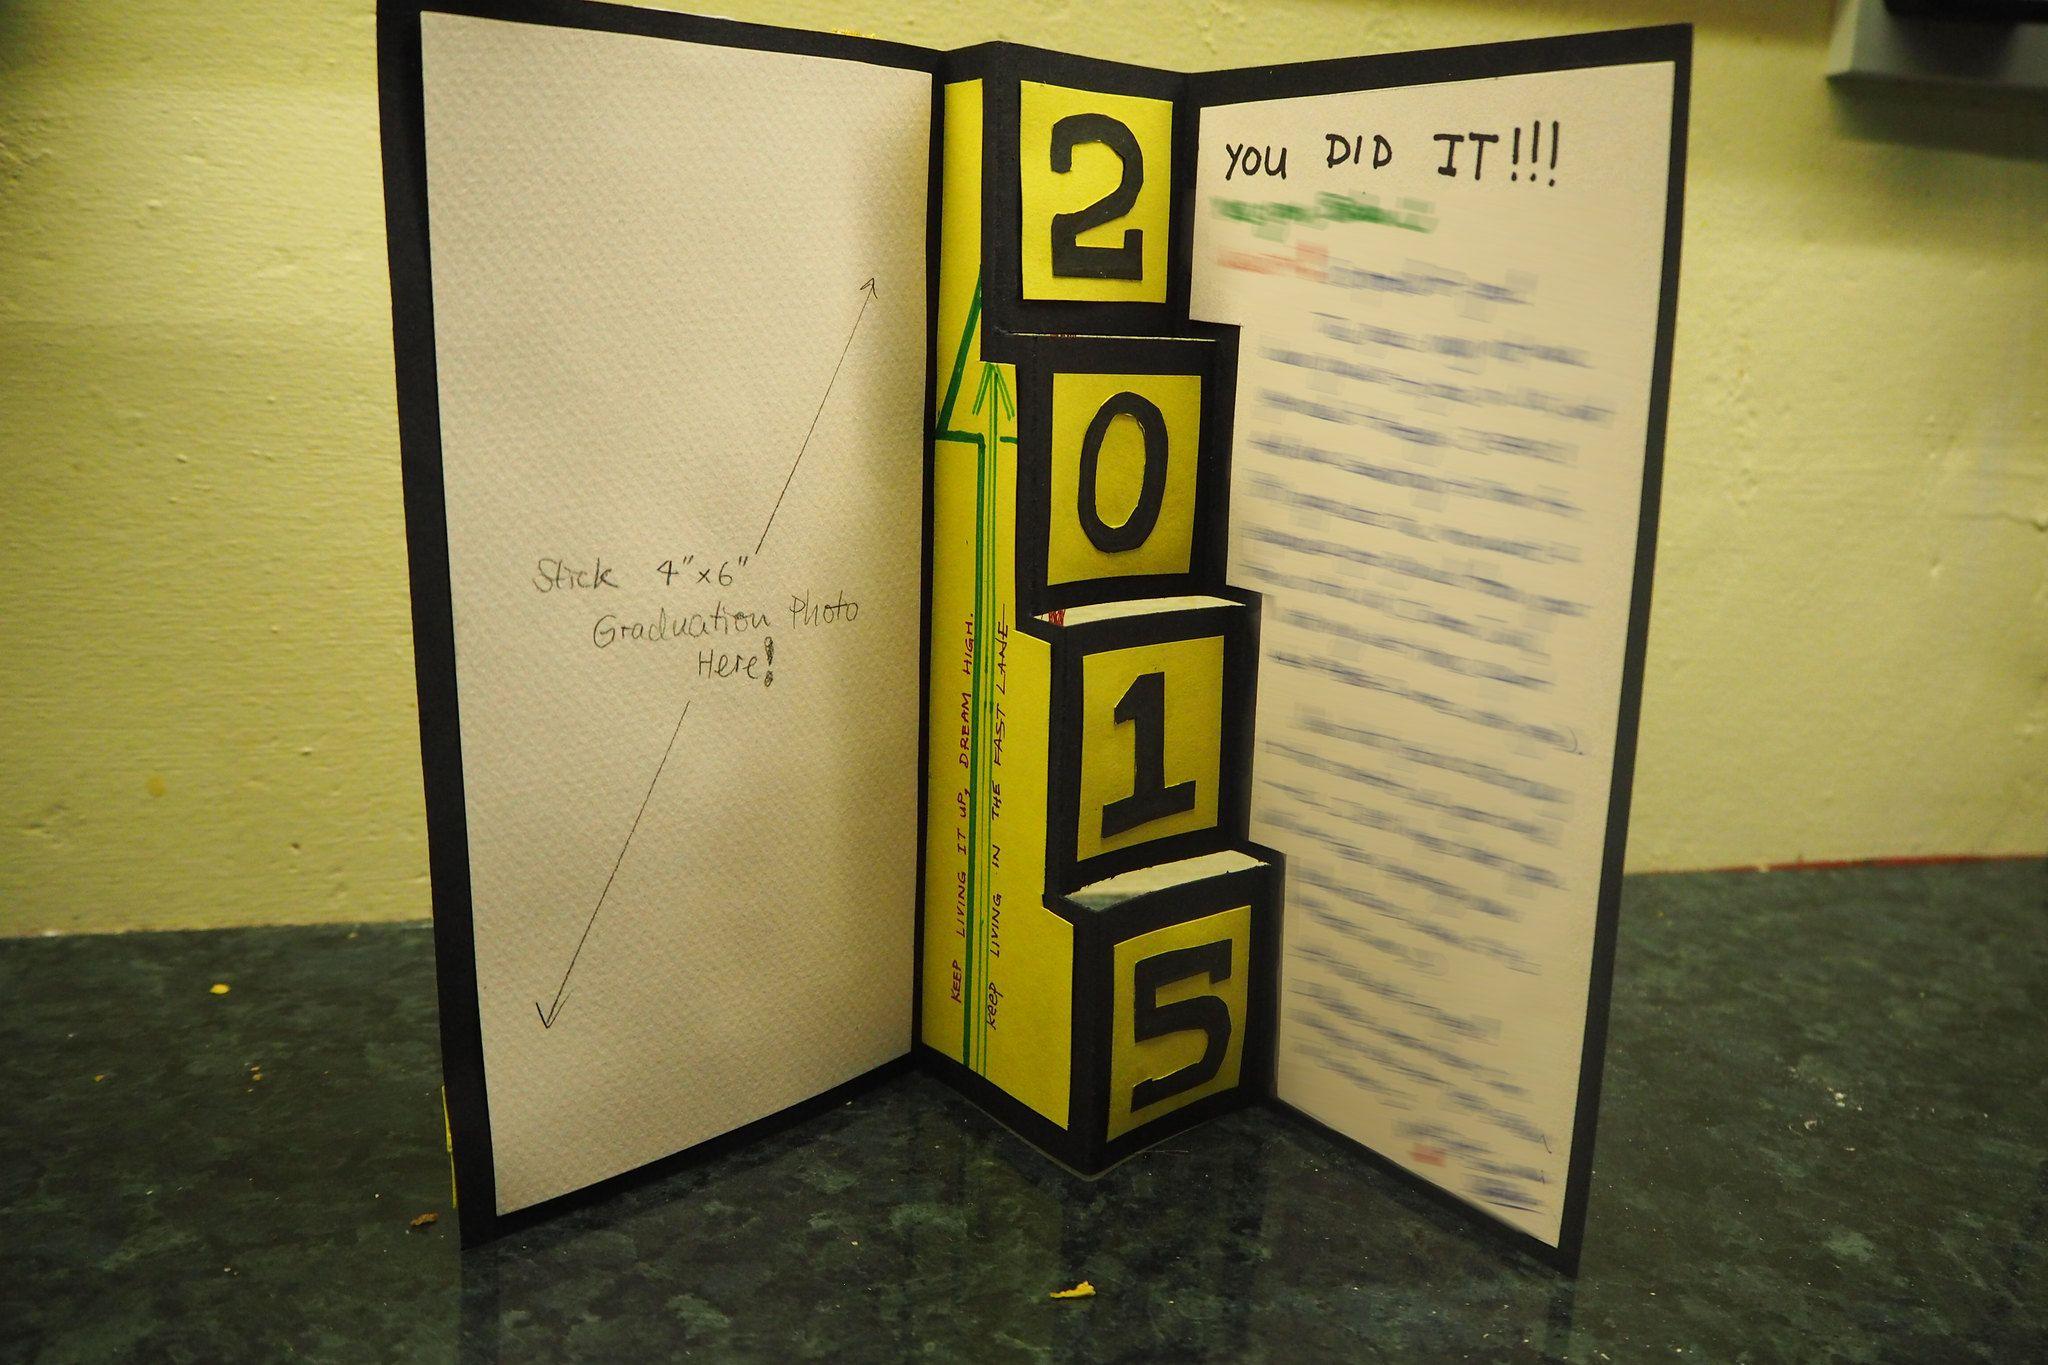 Diy graduation card ideas graduation diy diy graduation